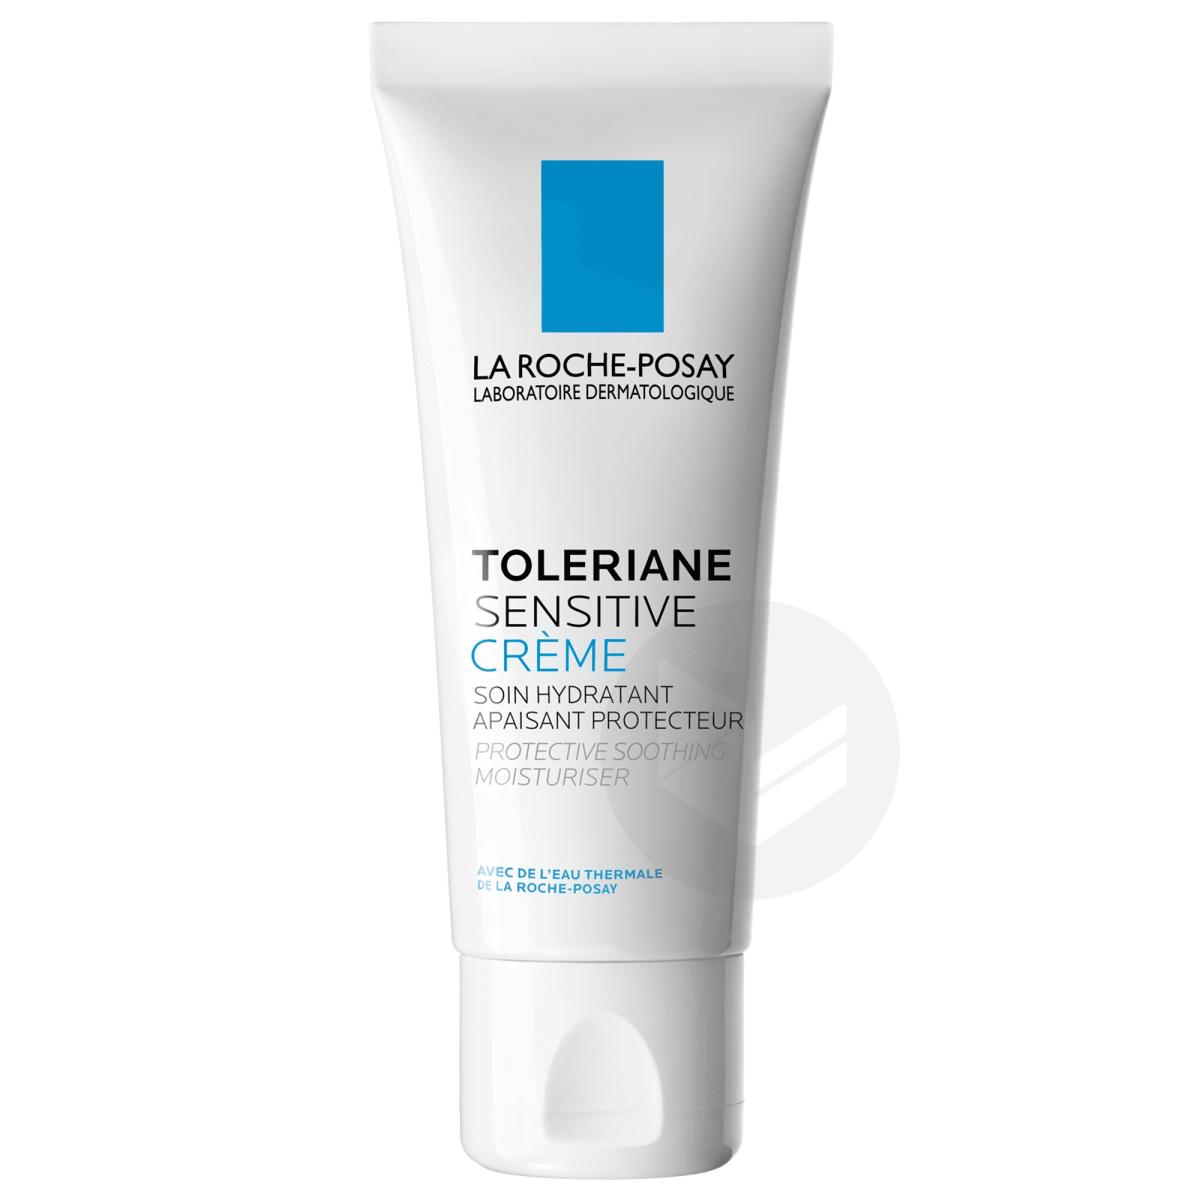 Toleriane Sensitive Soin hydratant apaisant protecteur 40ml